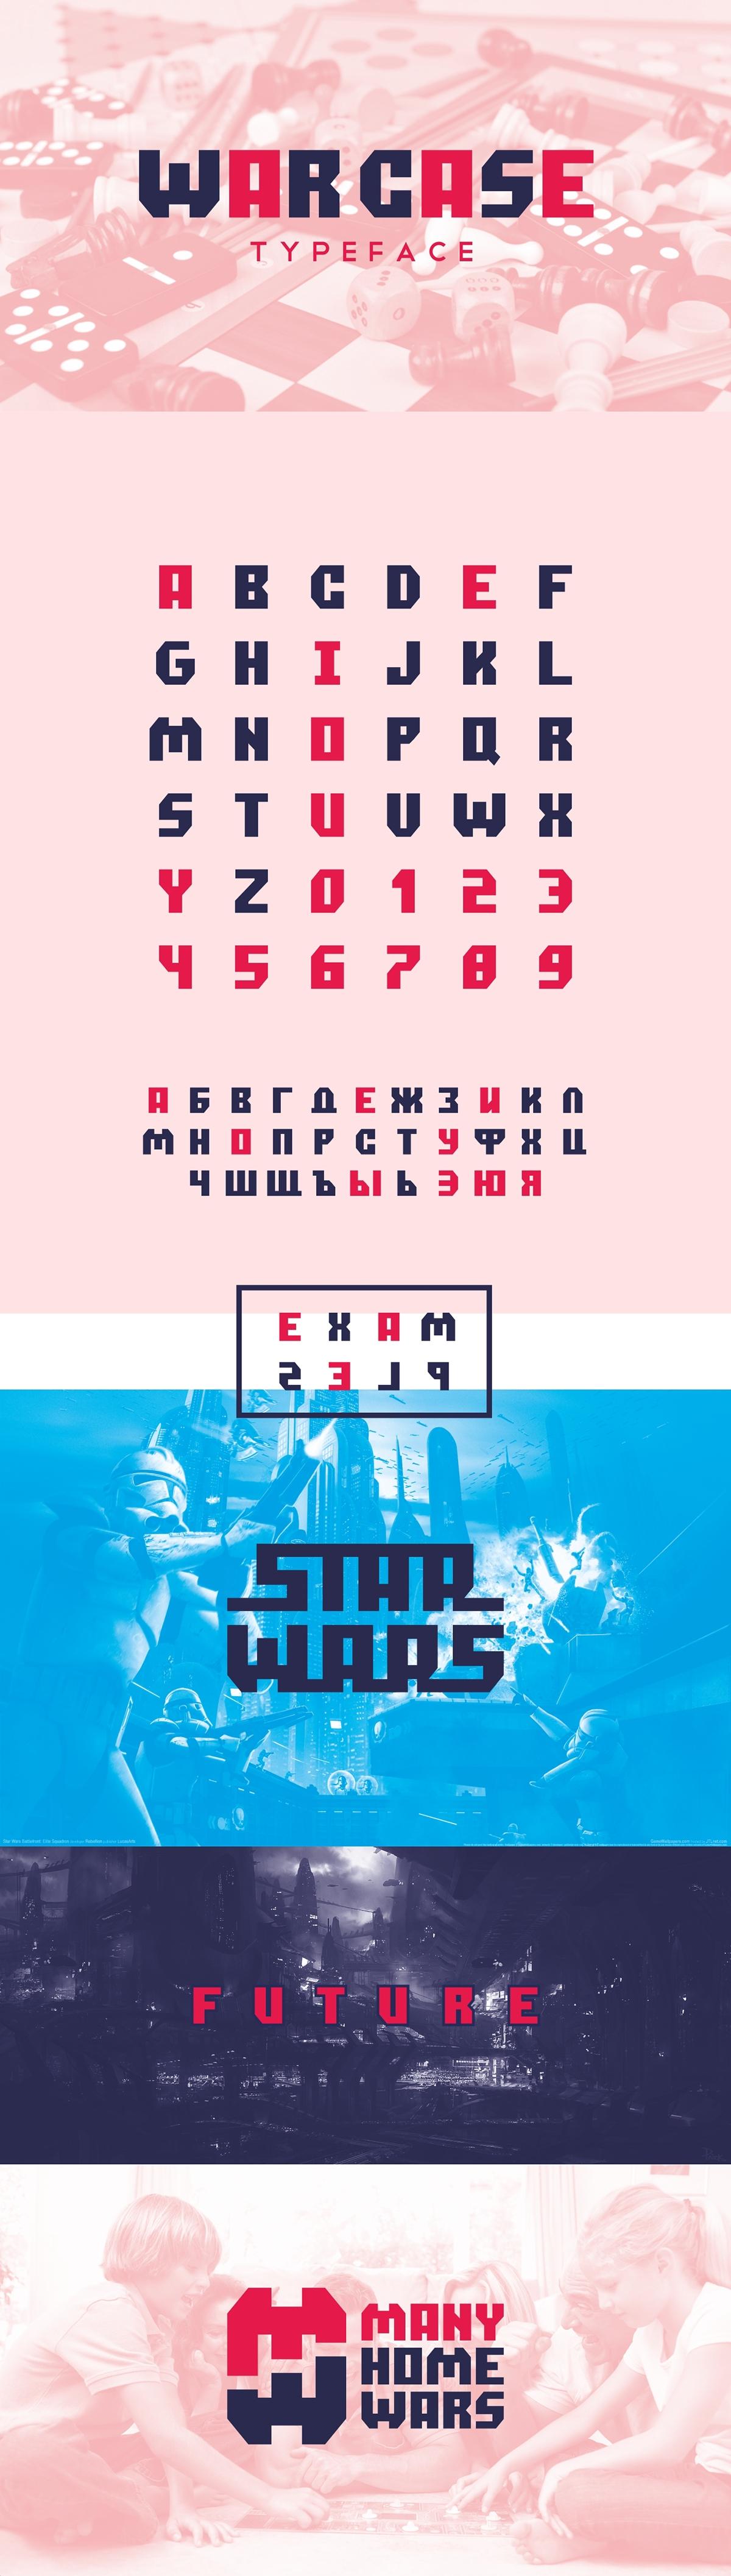 font Typeface logo Starwars star wars war font